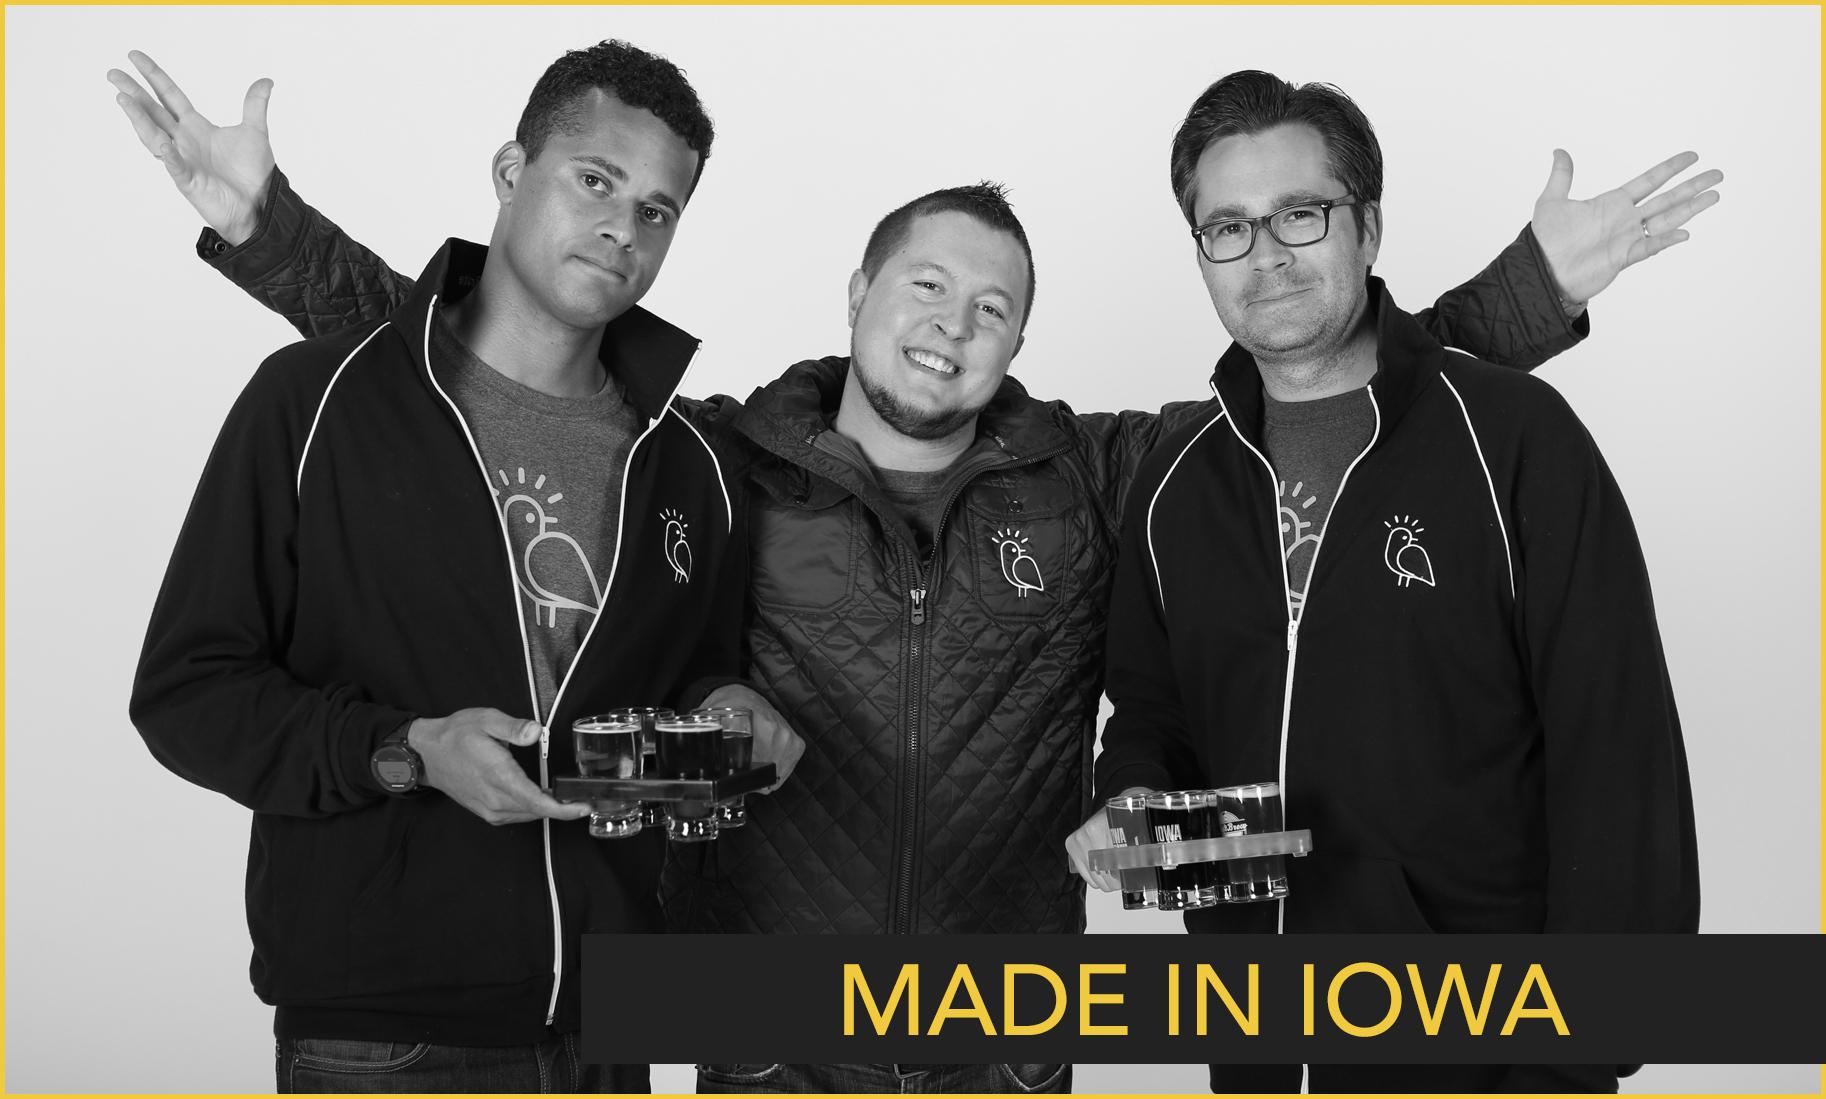 Made In Iowa